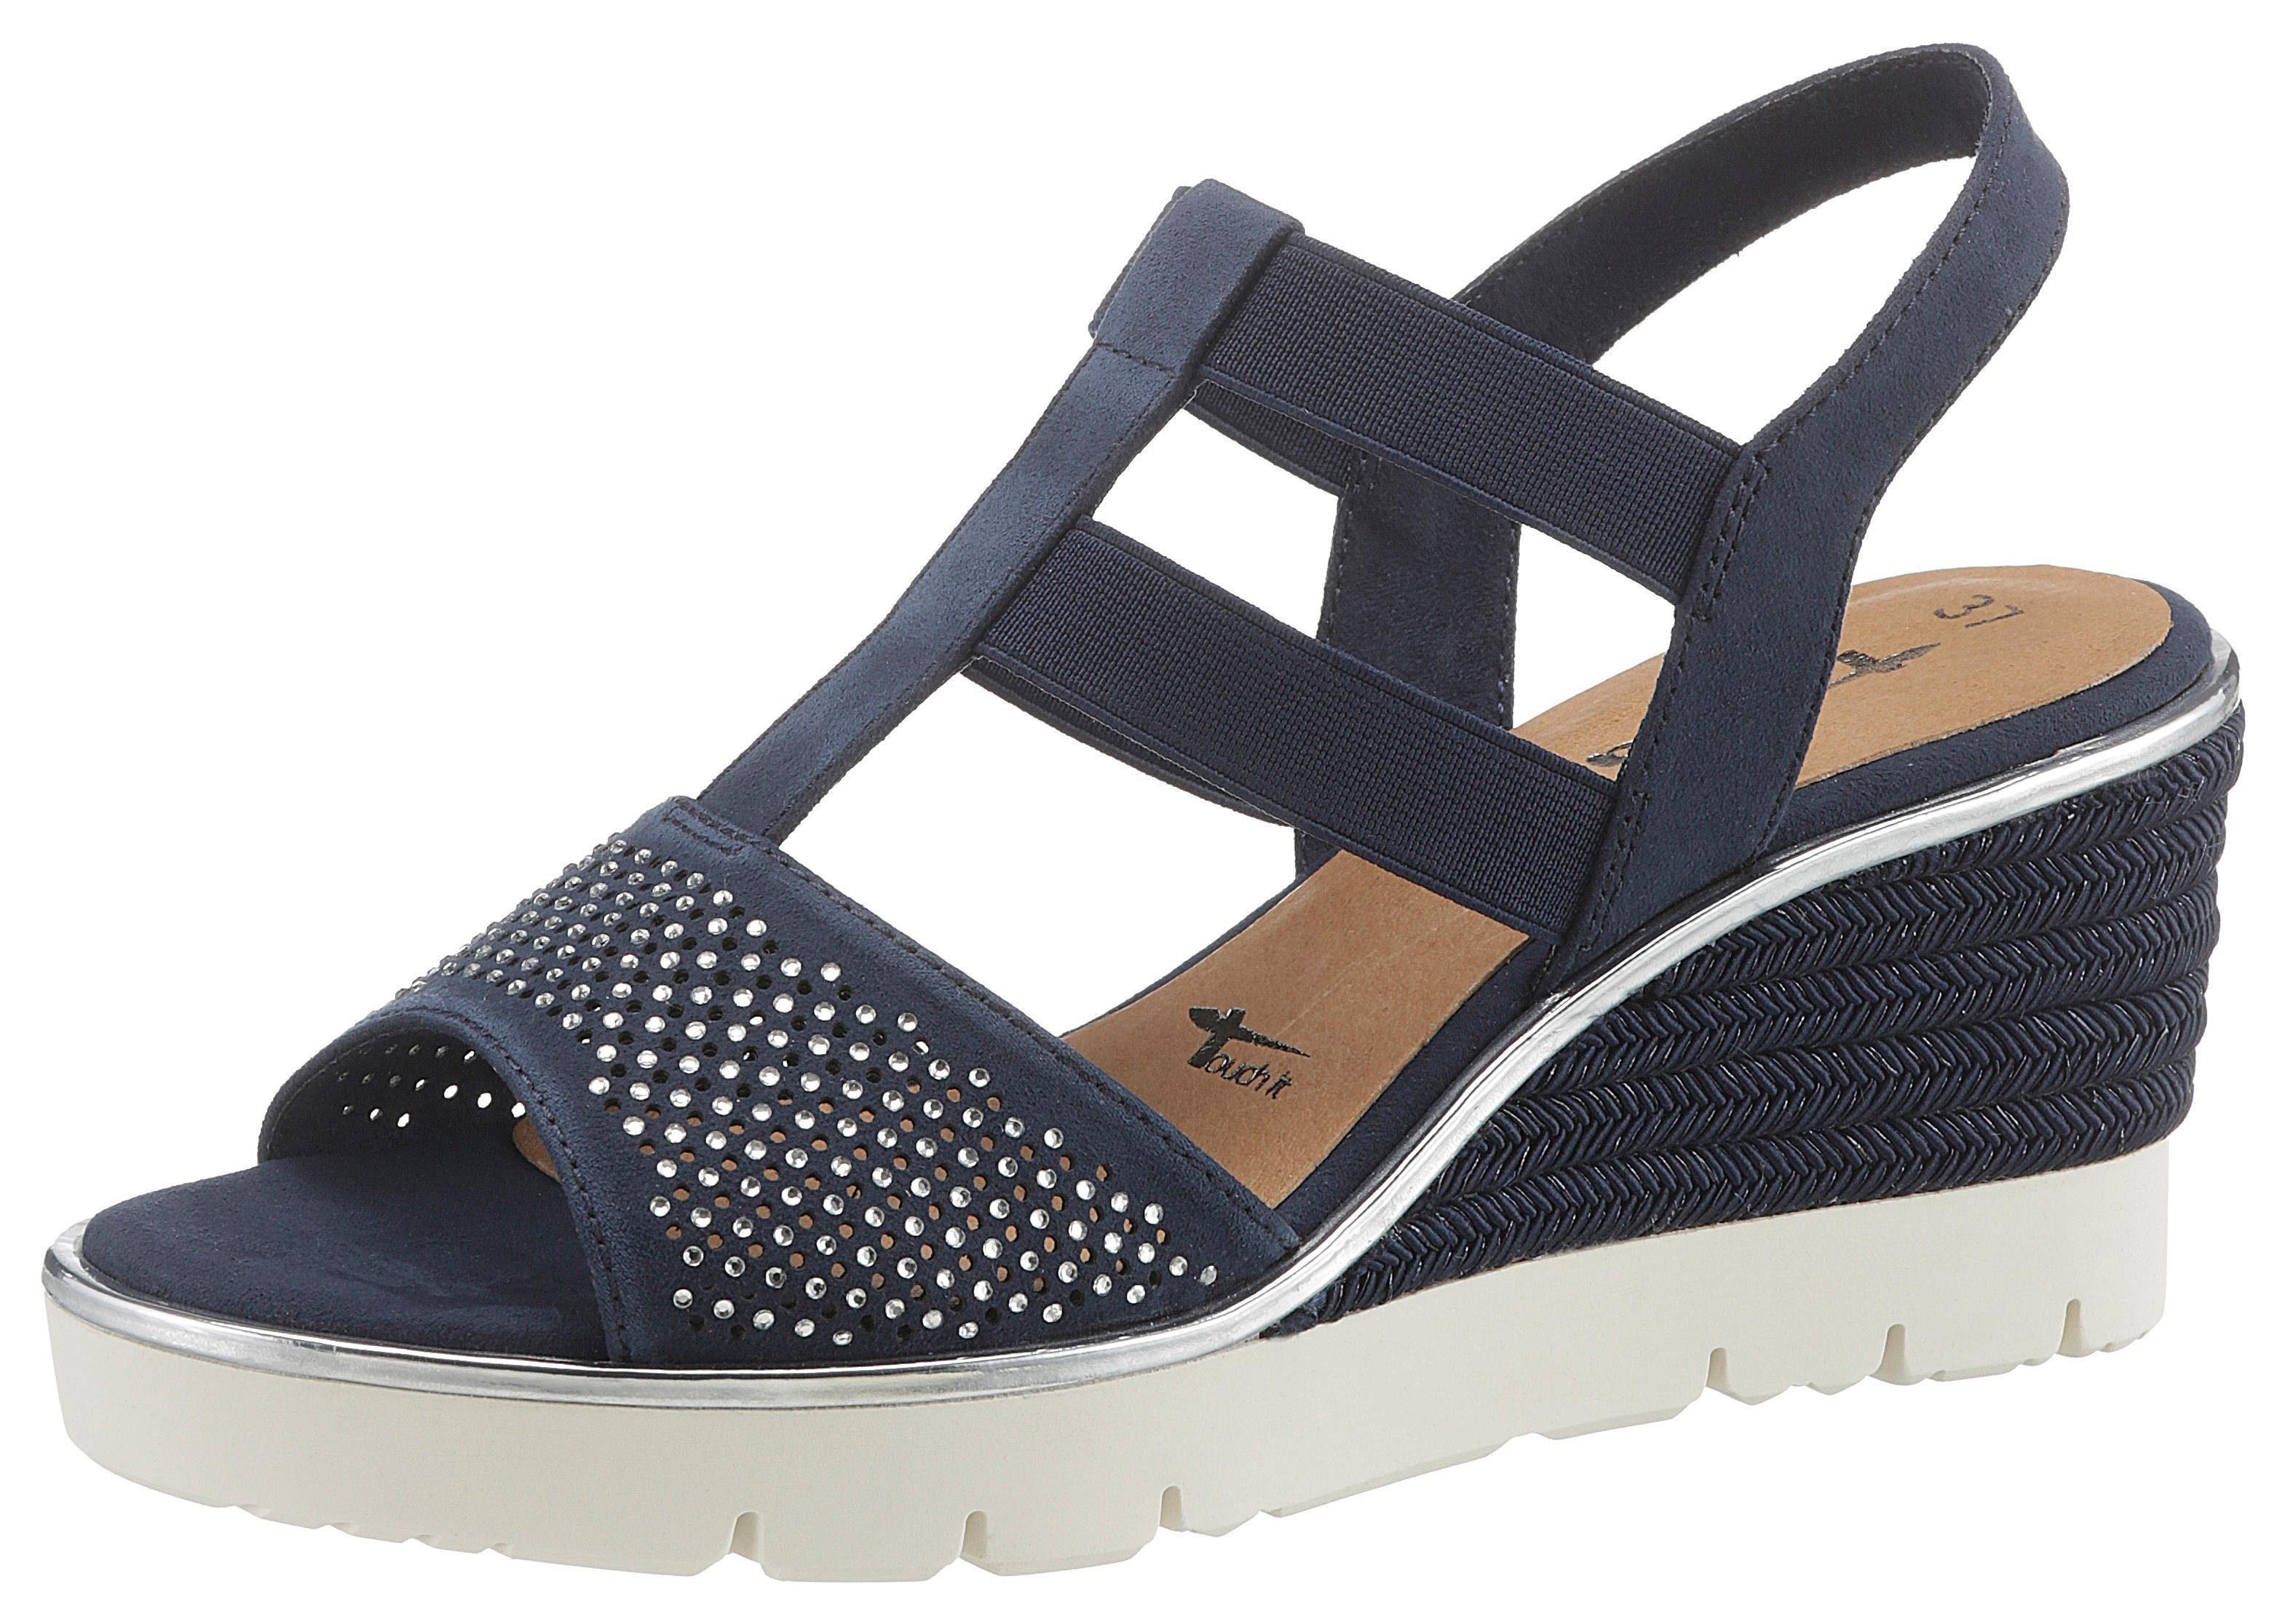 Tamaris »Cynara« Sandalette im maritimen Look | OTTO